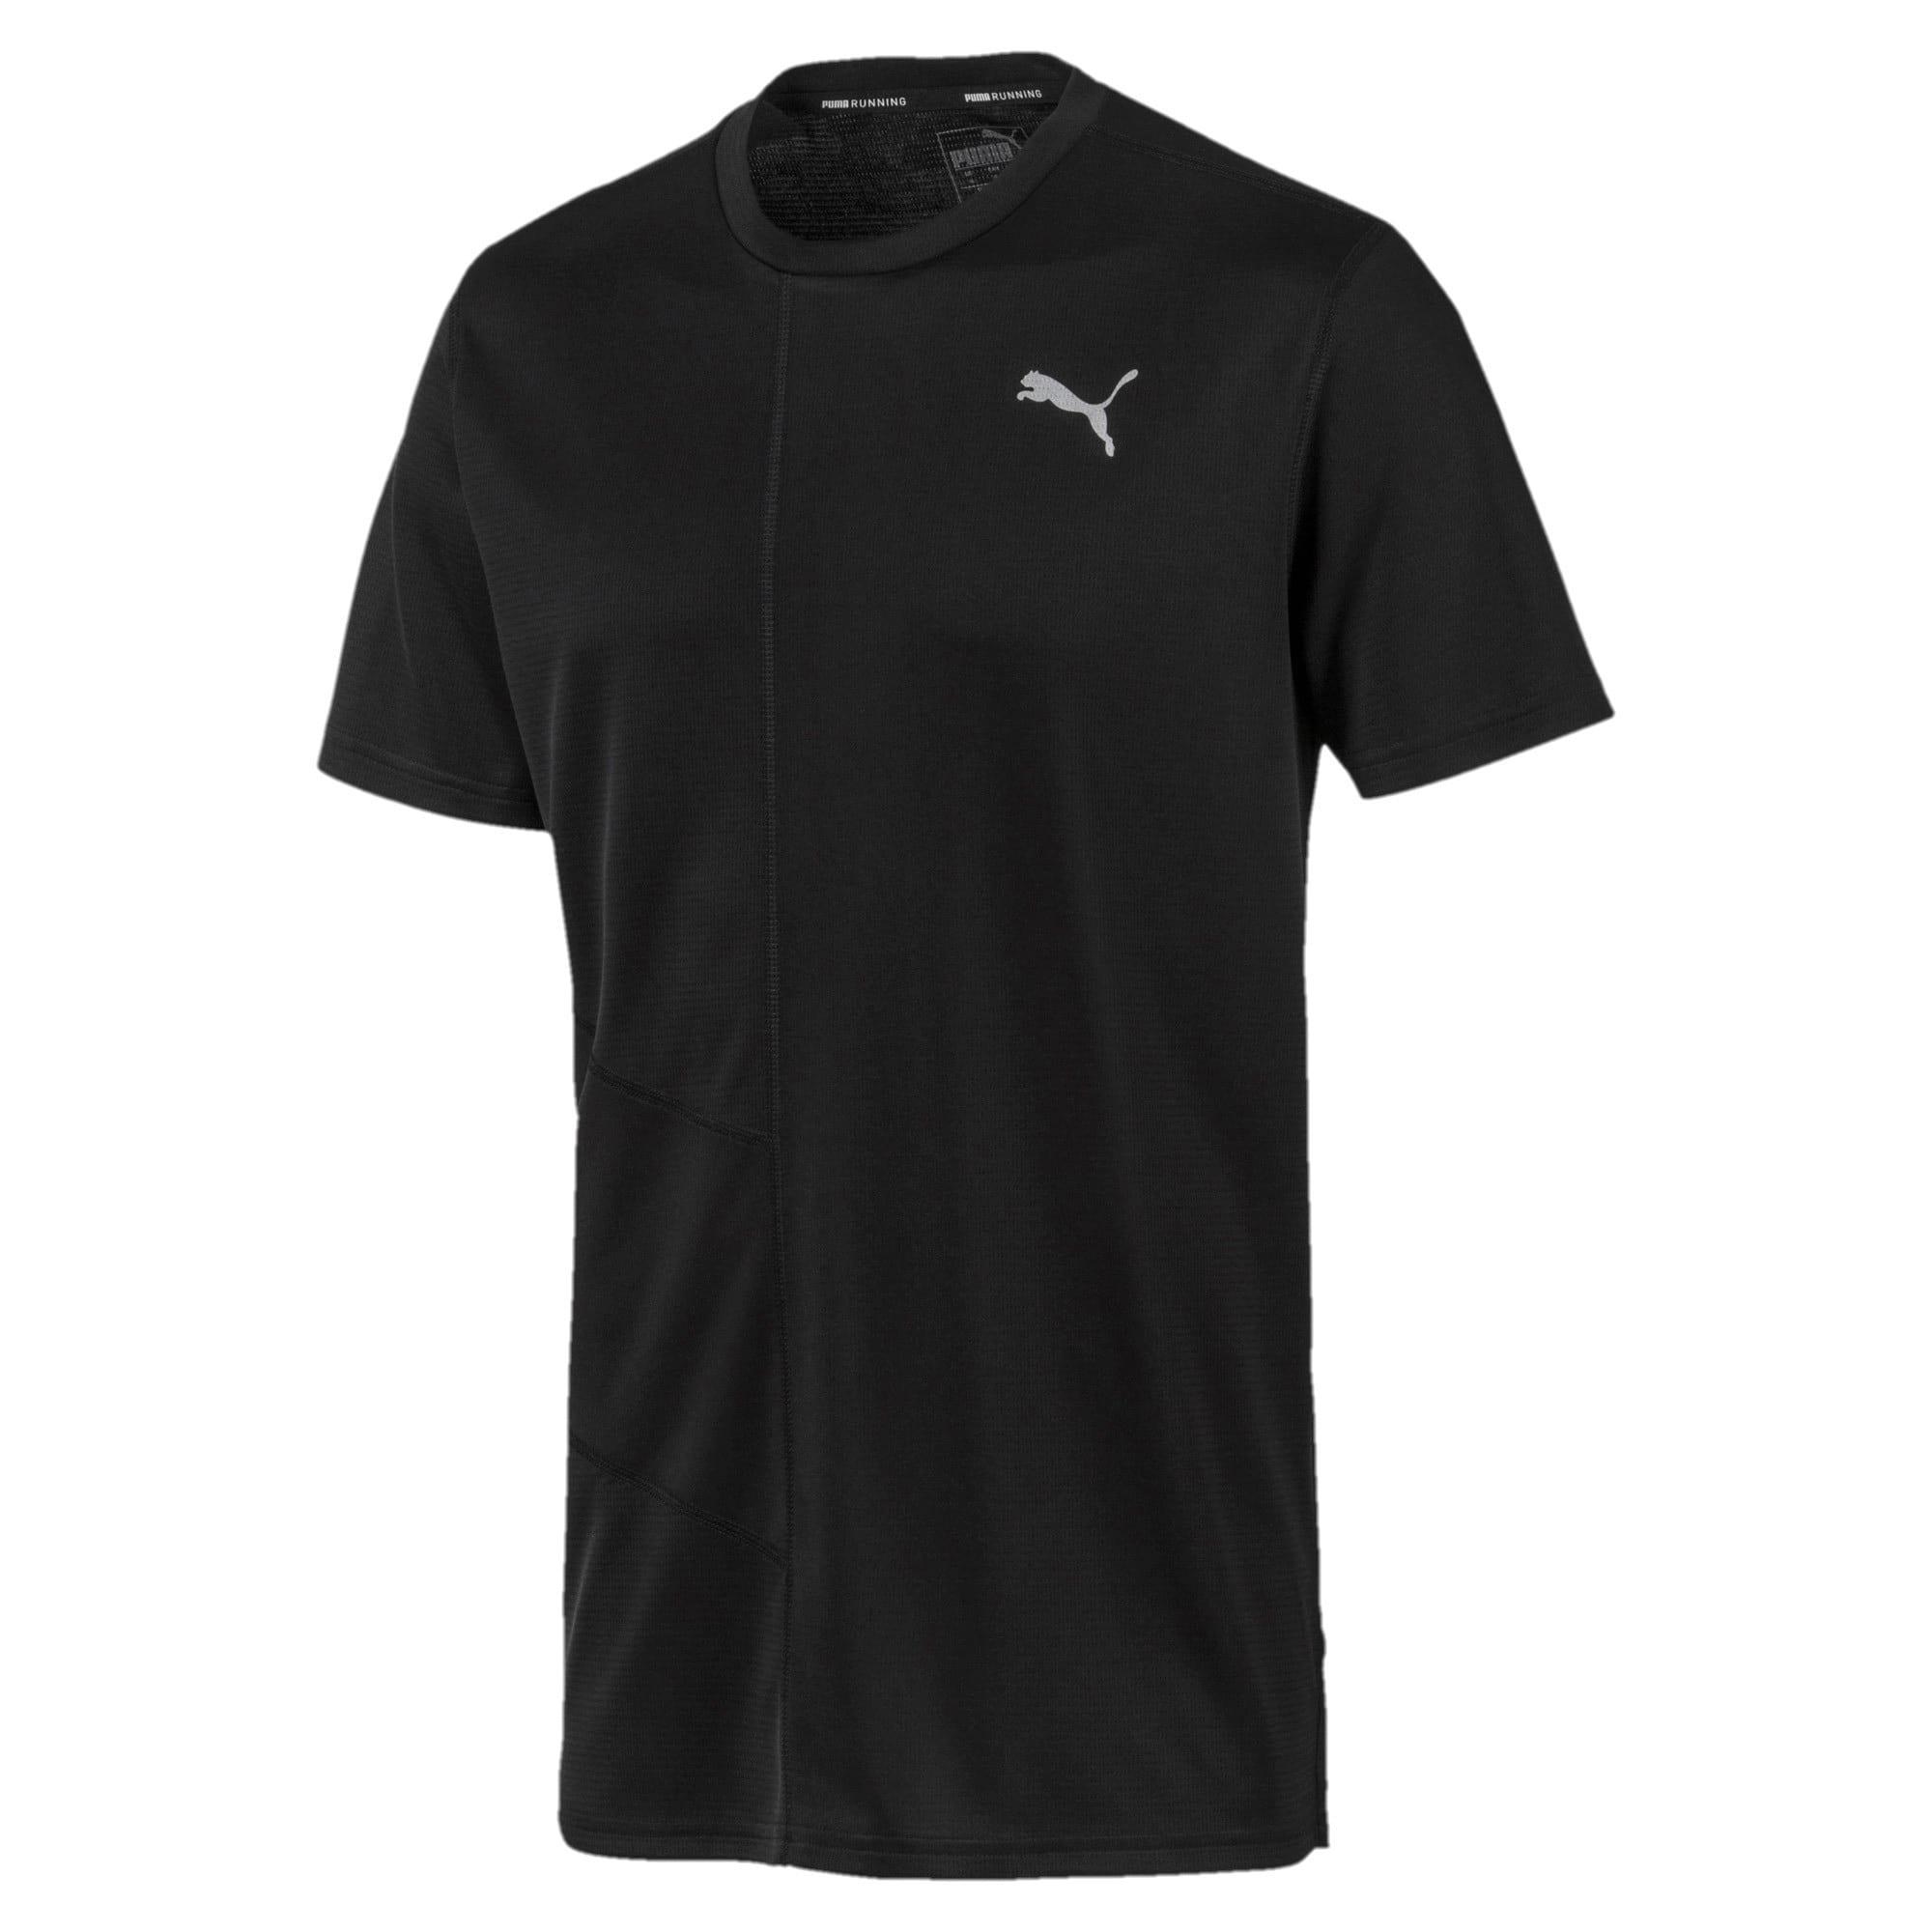 Thumbnail 4 of IGNITE hardloopshirt voor heren, Puma Black, medium